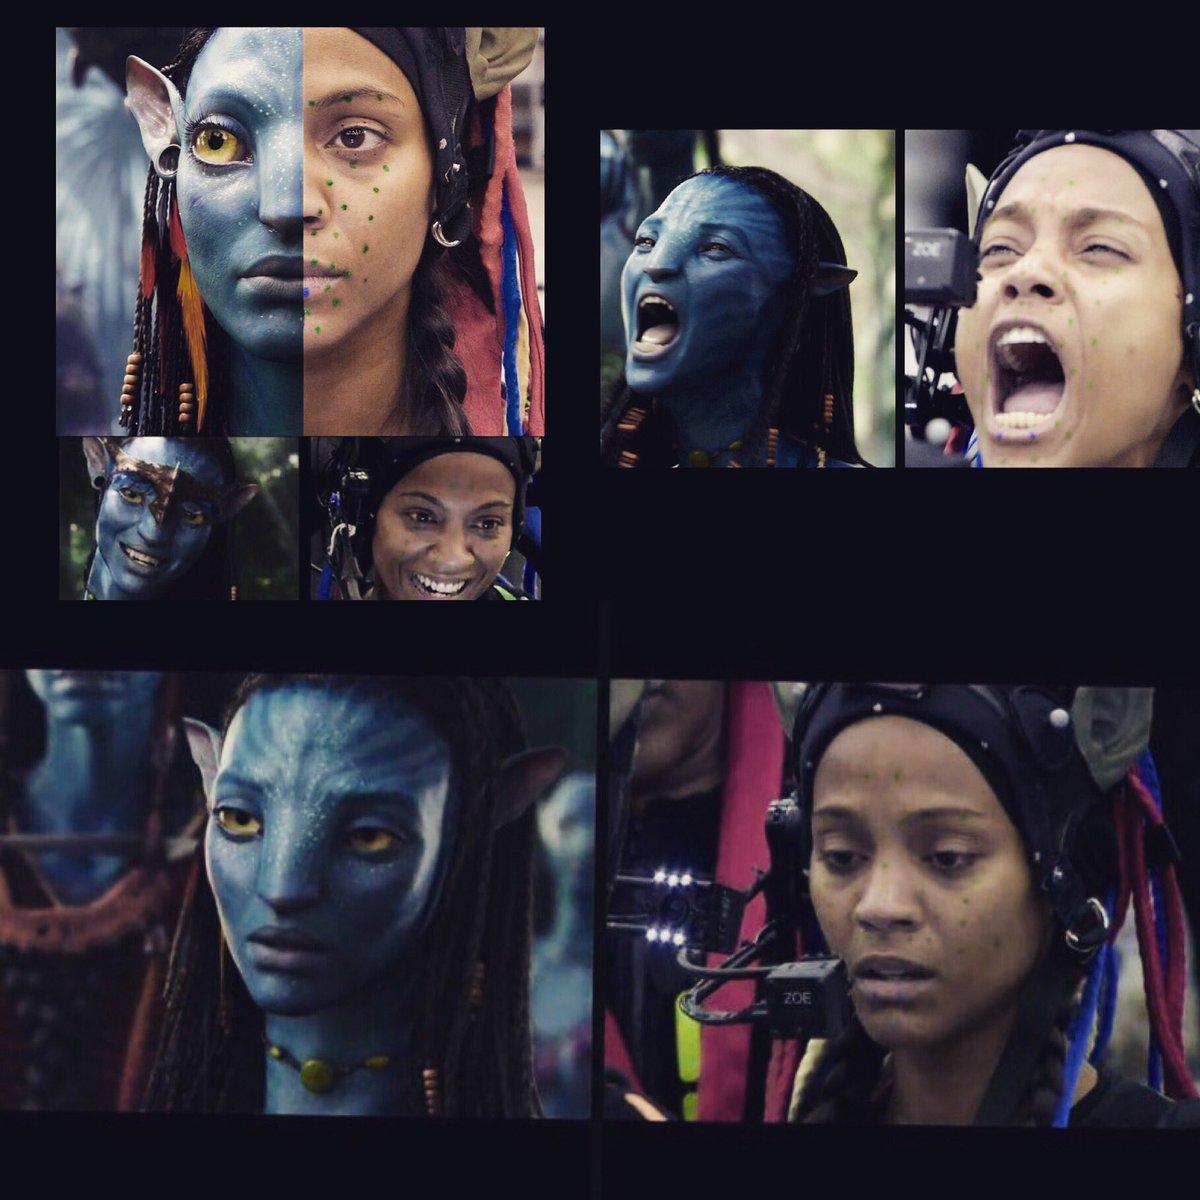 BTS of filming @officialavatar - transforming into Neytiri!  #transformationtuesday https://t.co/Qvy4VgSpRo